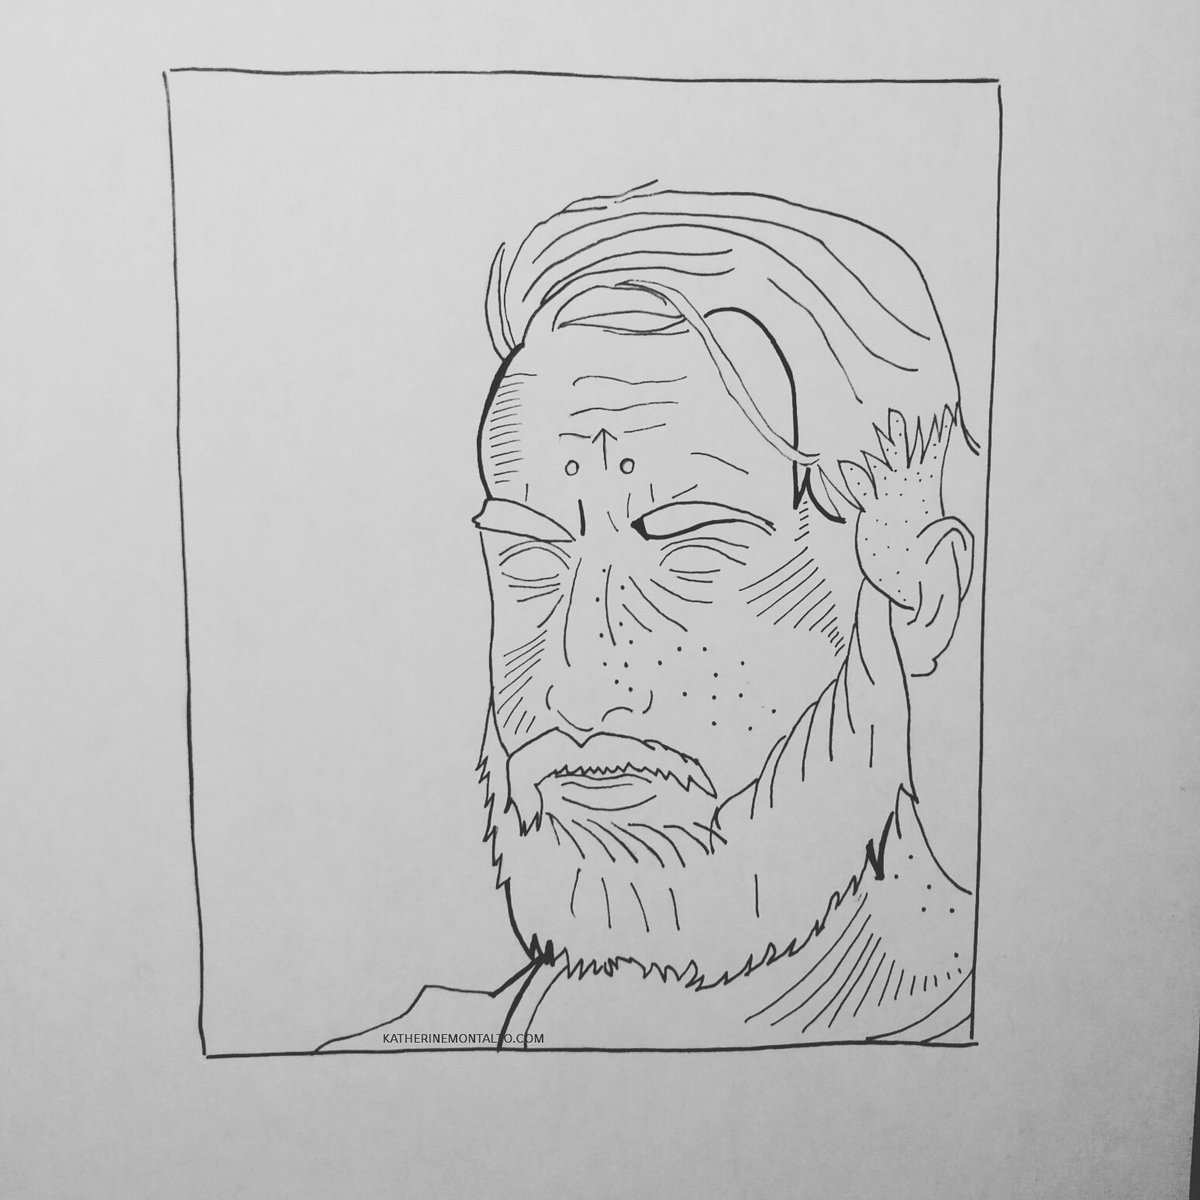 Marcus #illustration #lineart #drawing #art https://t.co/oLEFjDlgUi